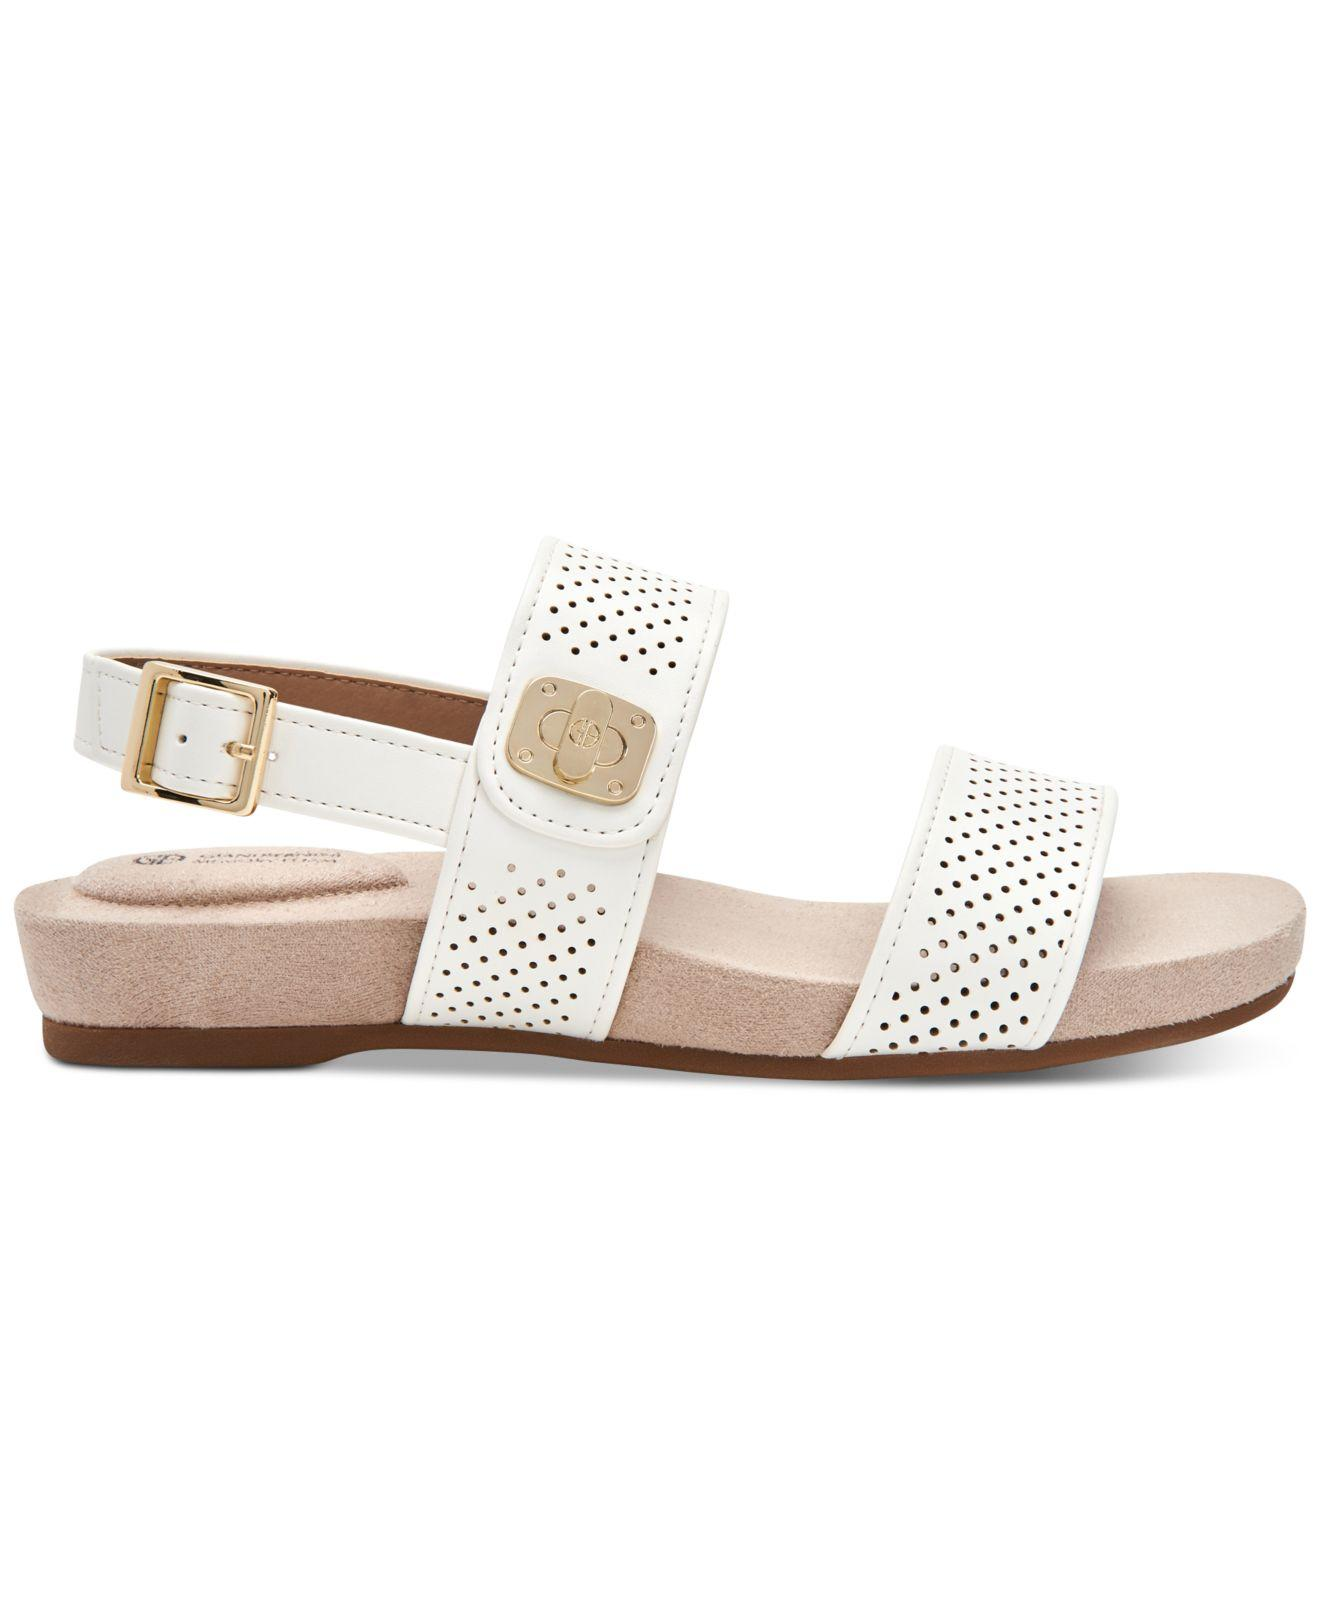 9becfceb494fb Lyst - Giani Bernini Ramonaa Memory Foam Footbed Sandals